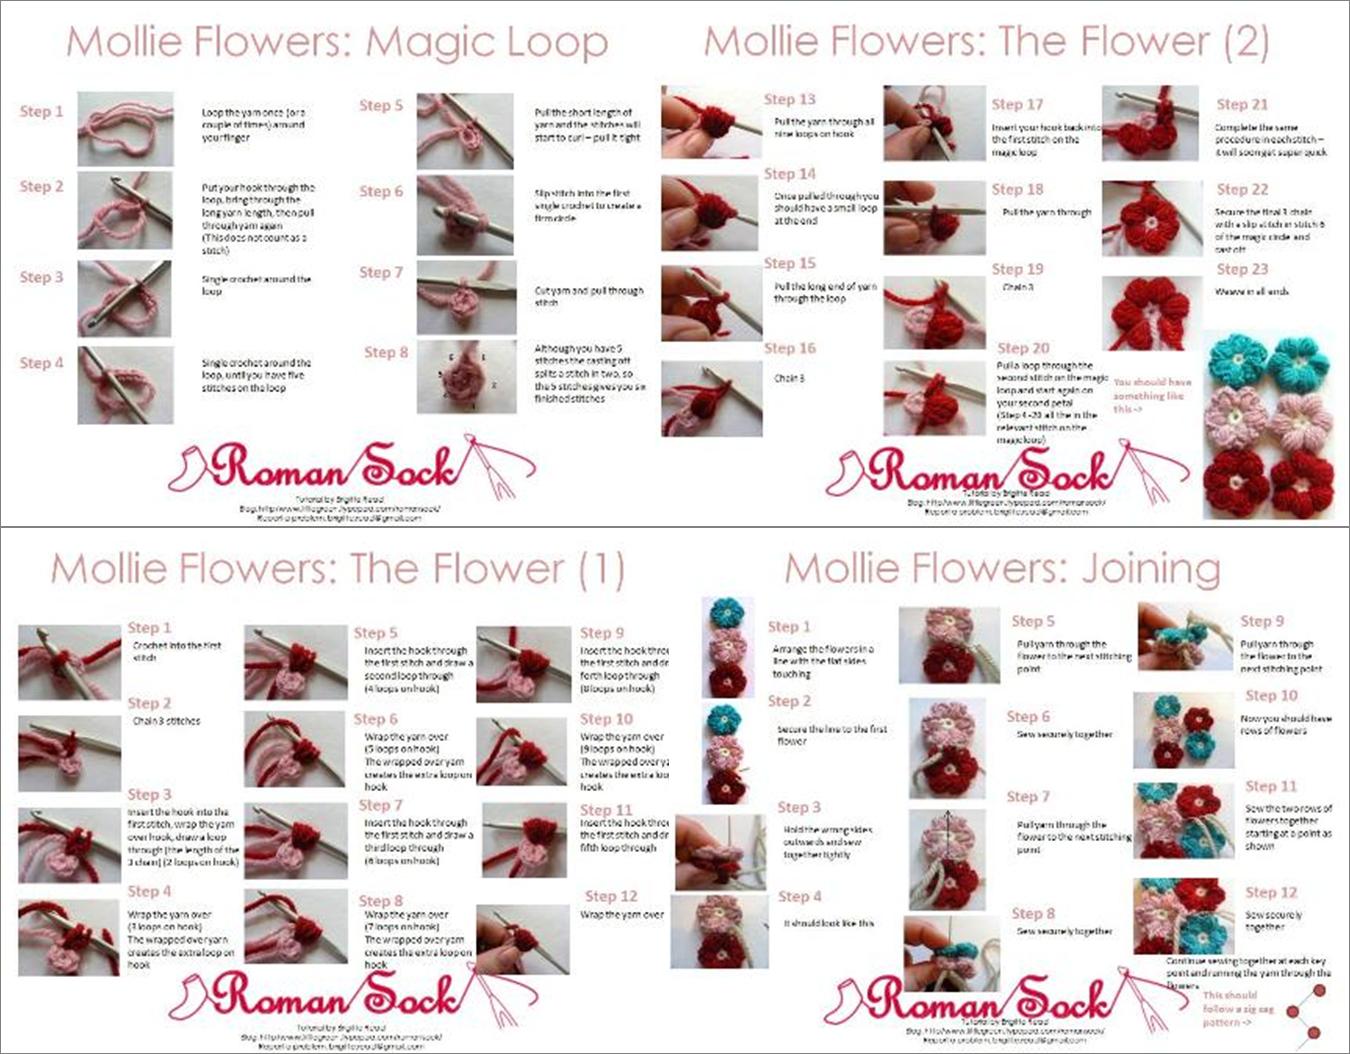 6a00d8352f394169e201157037a426970b Pi 13501054 Pretty Things Rose Crochet Flores Crochetflowers Flower Diagram Mollie Flowers Step By